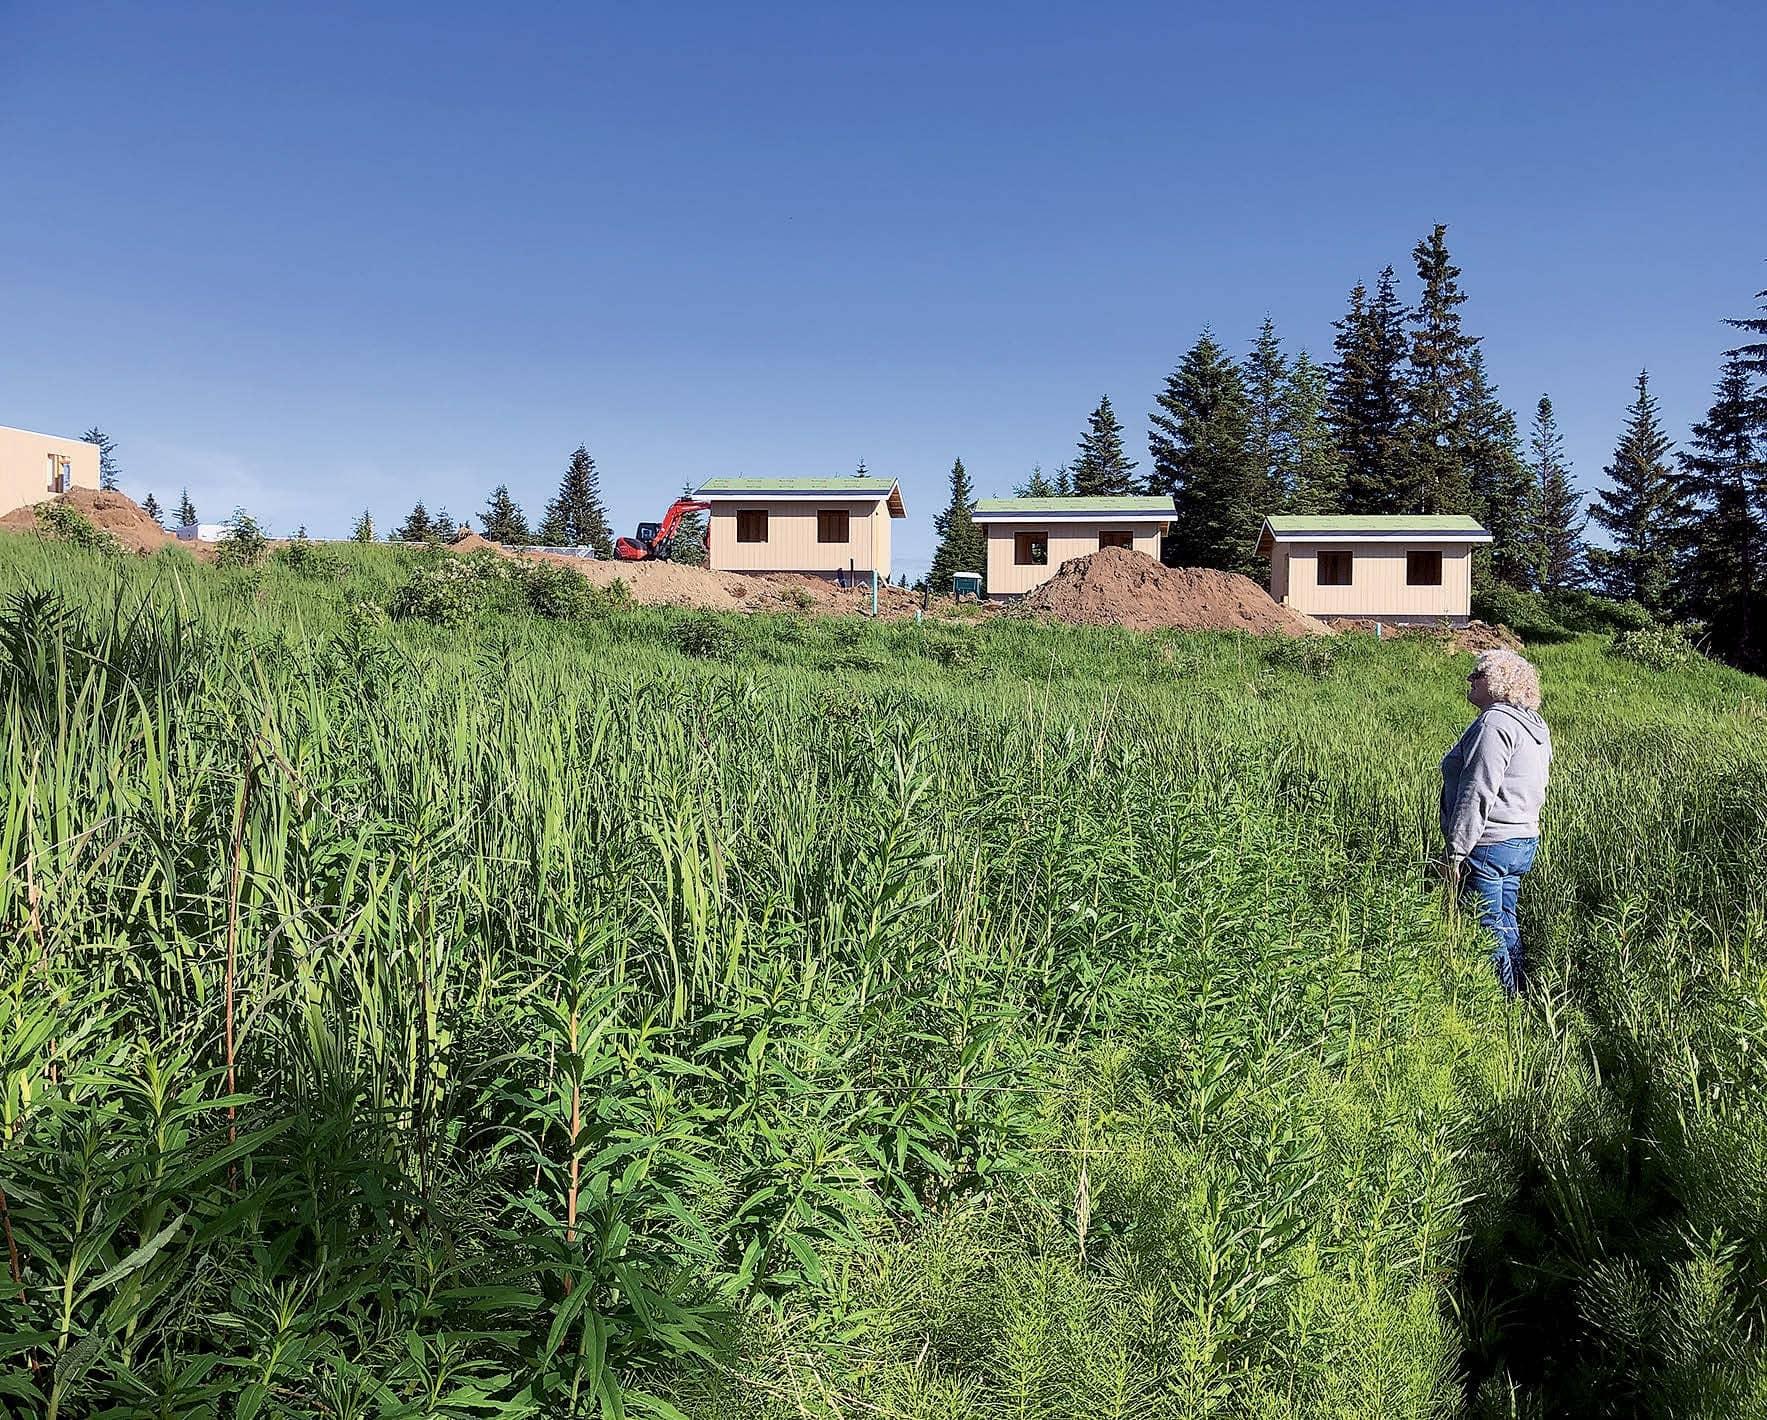 An Alaska Retreat For Women Writers